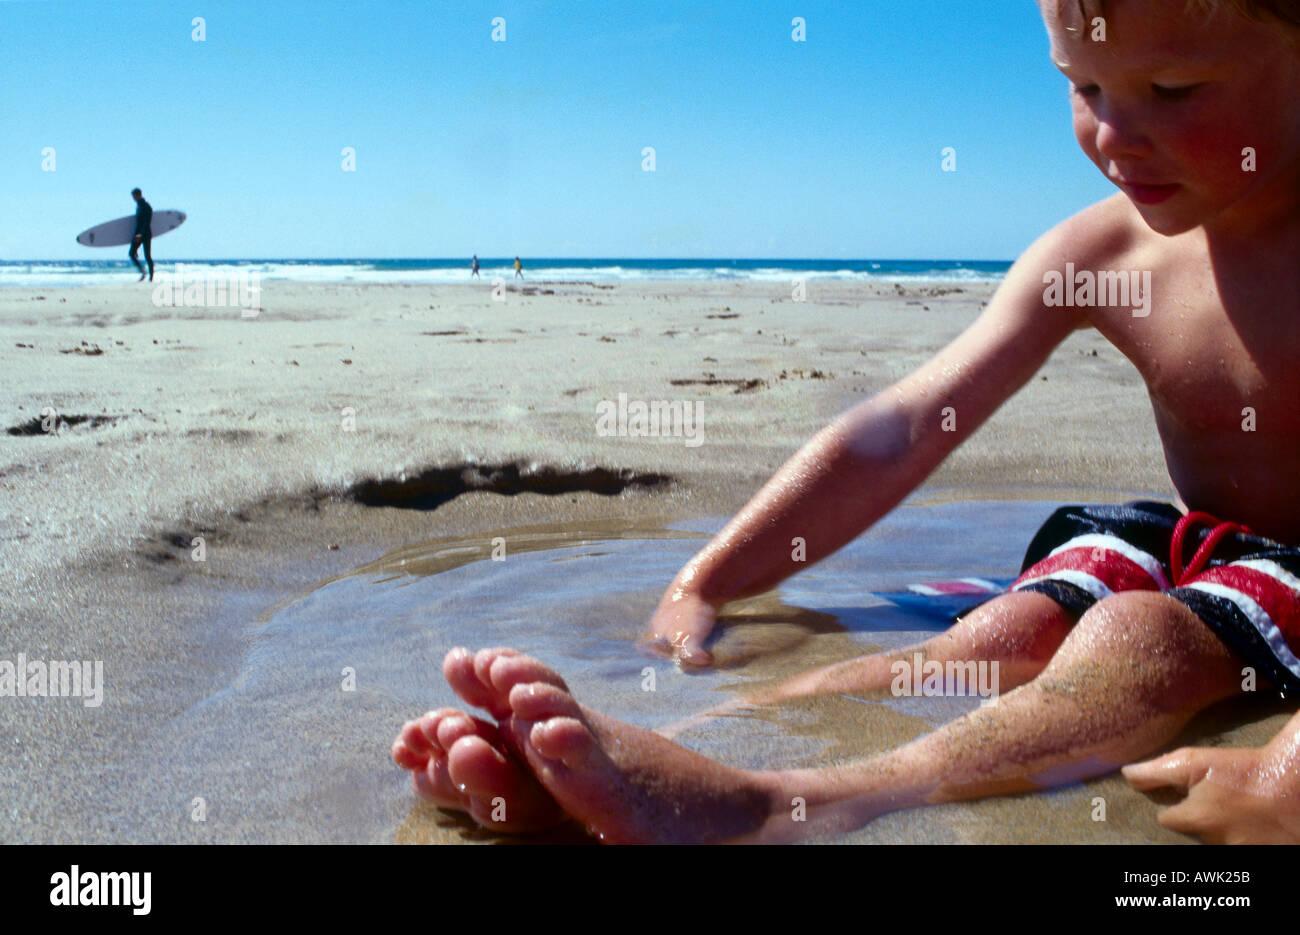 Boy playing at beach - Stock Image